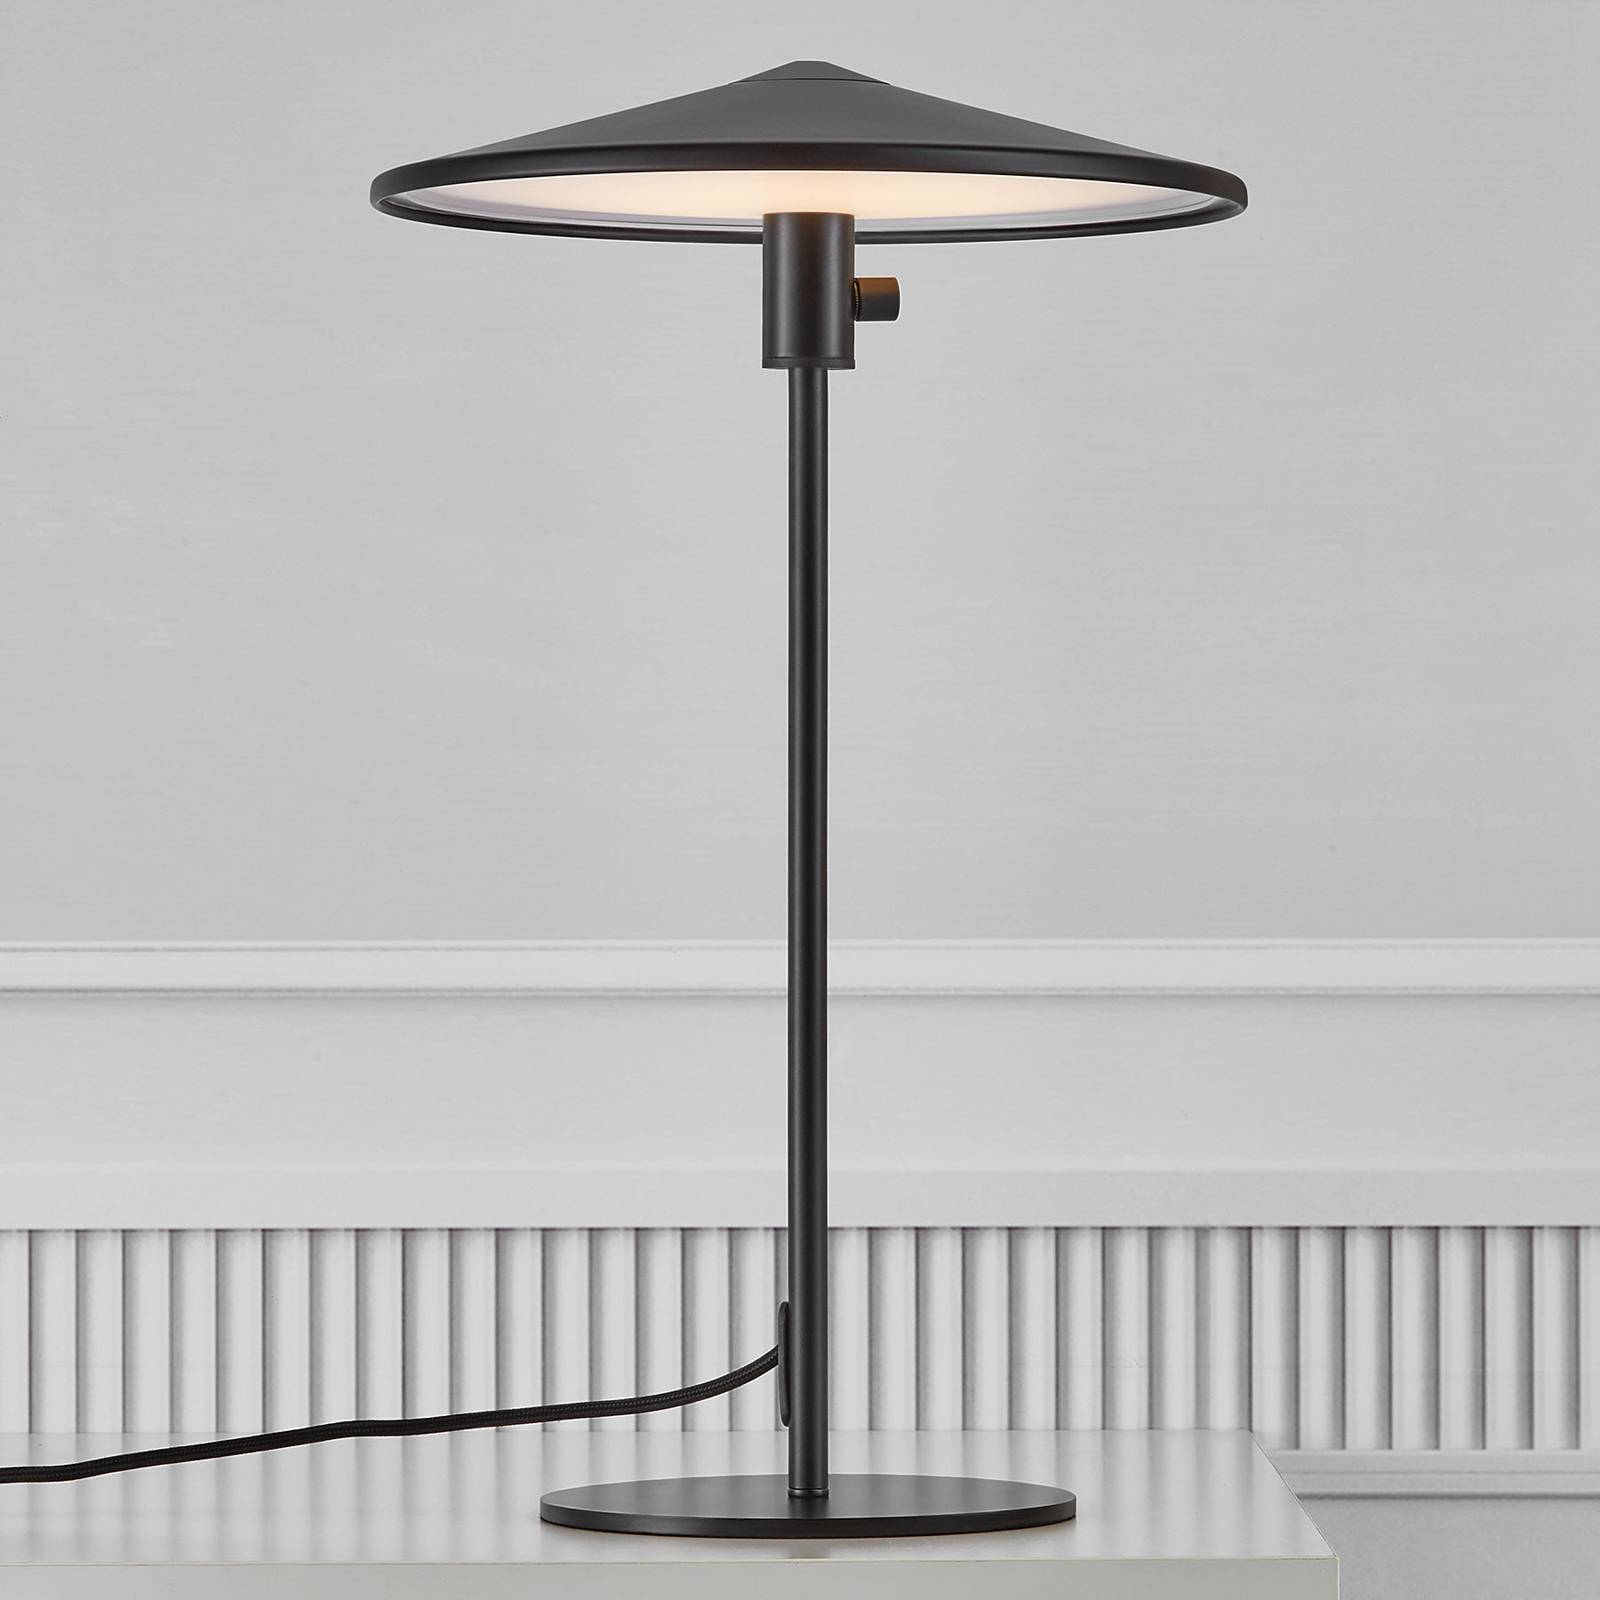 LED-pöytälamppu Balance, integroitu himmennin